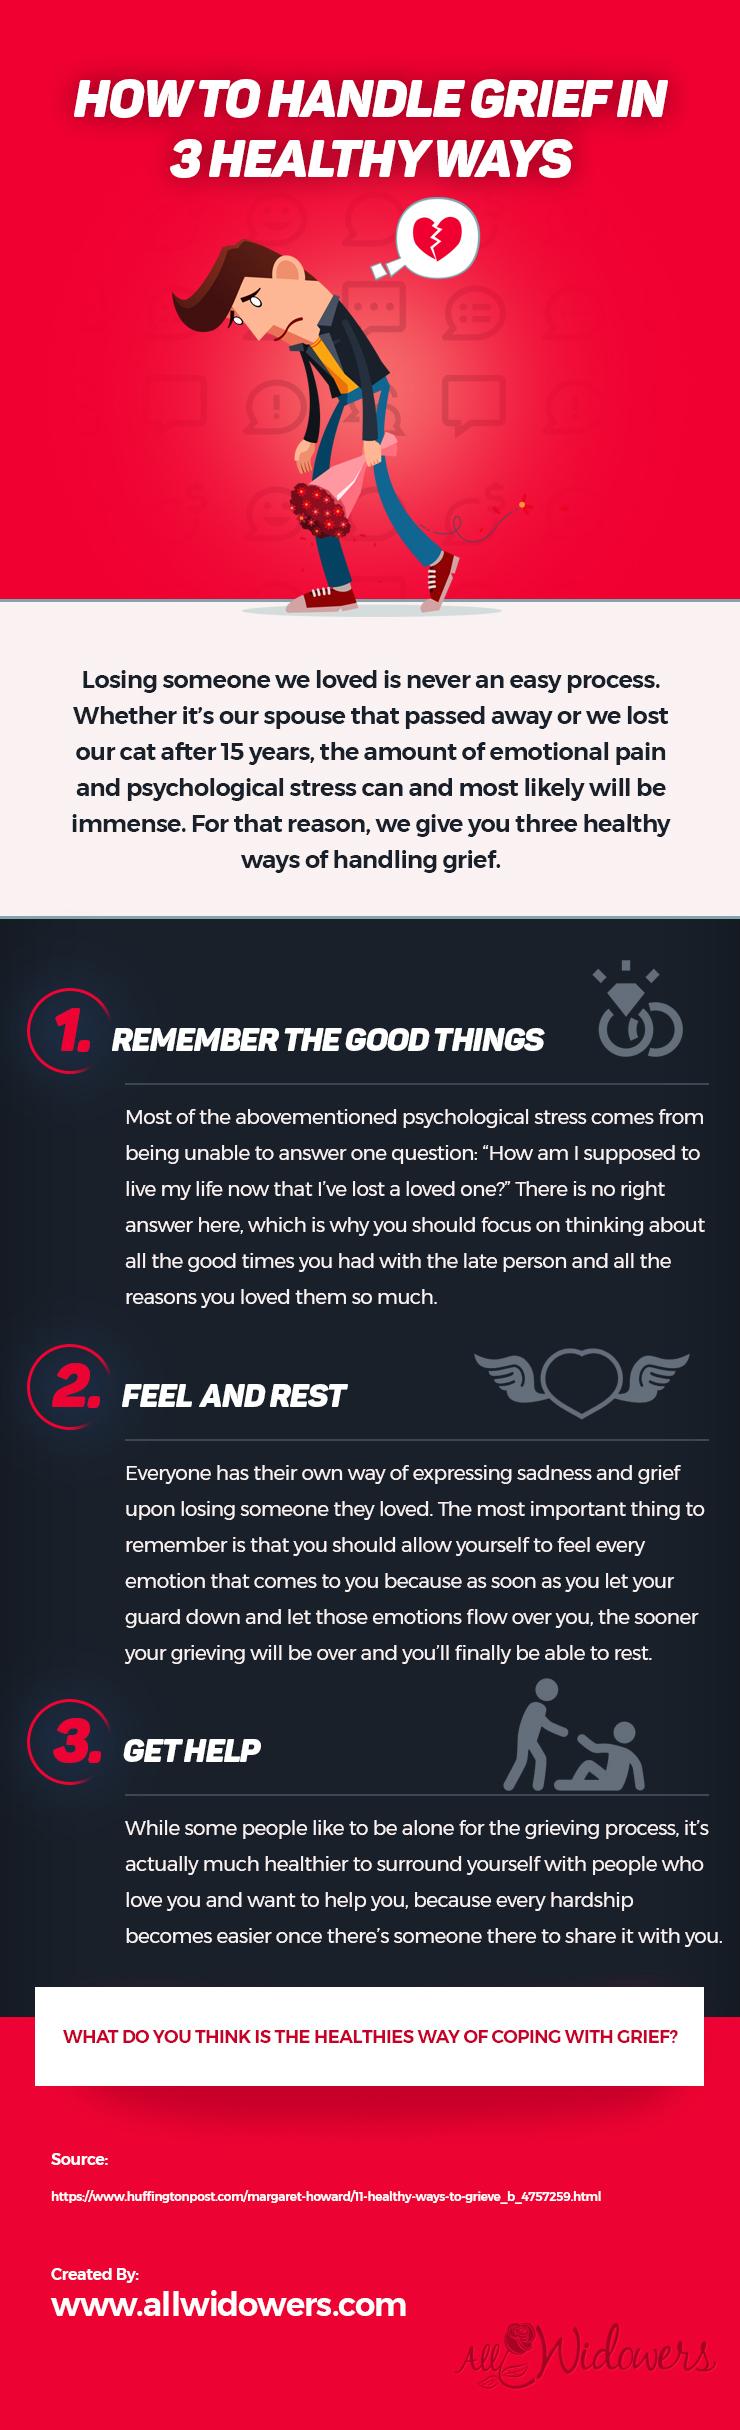 How to Handle Grief in 3 Healthy Ways